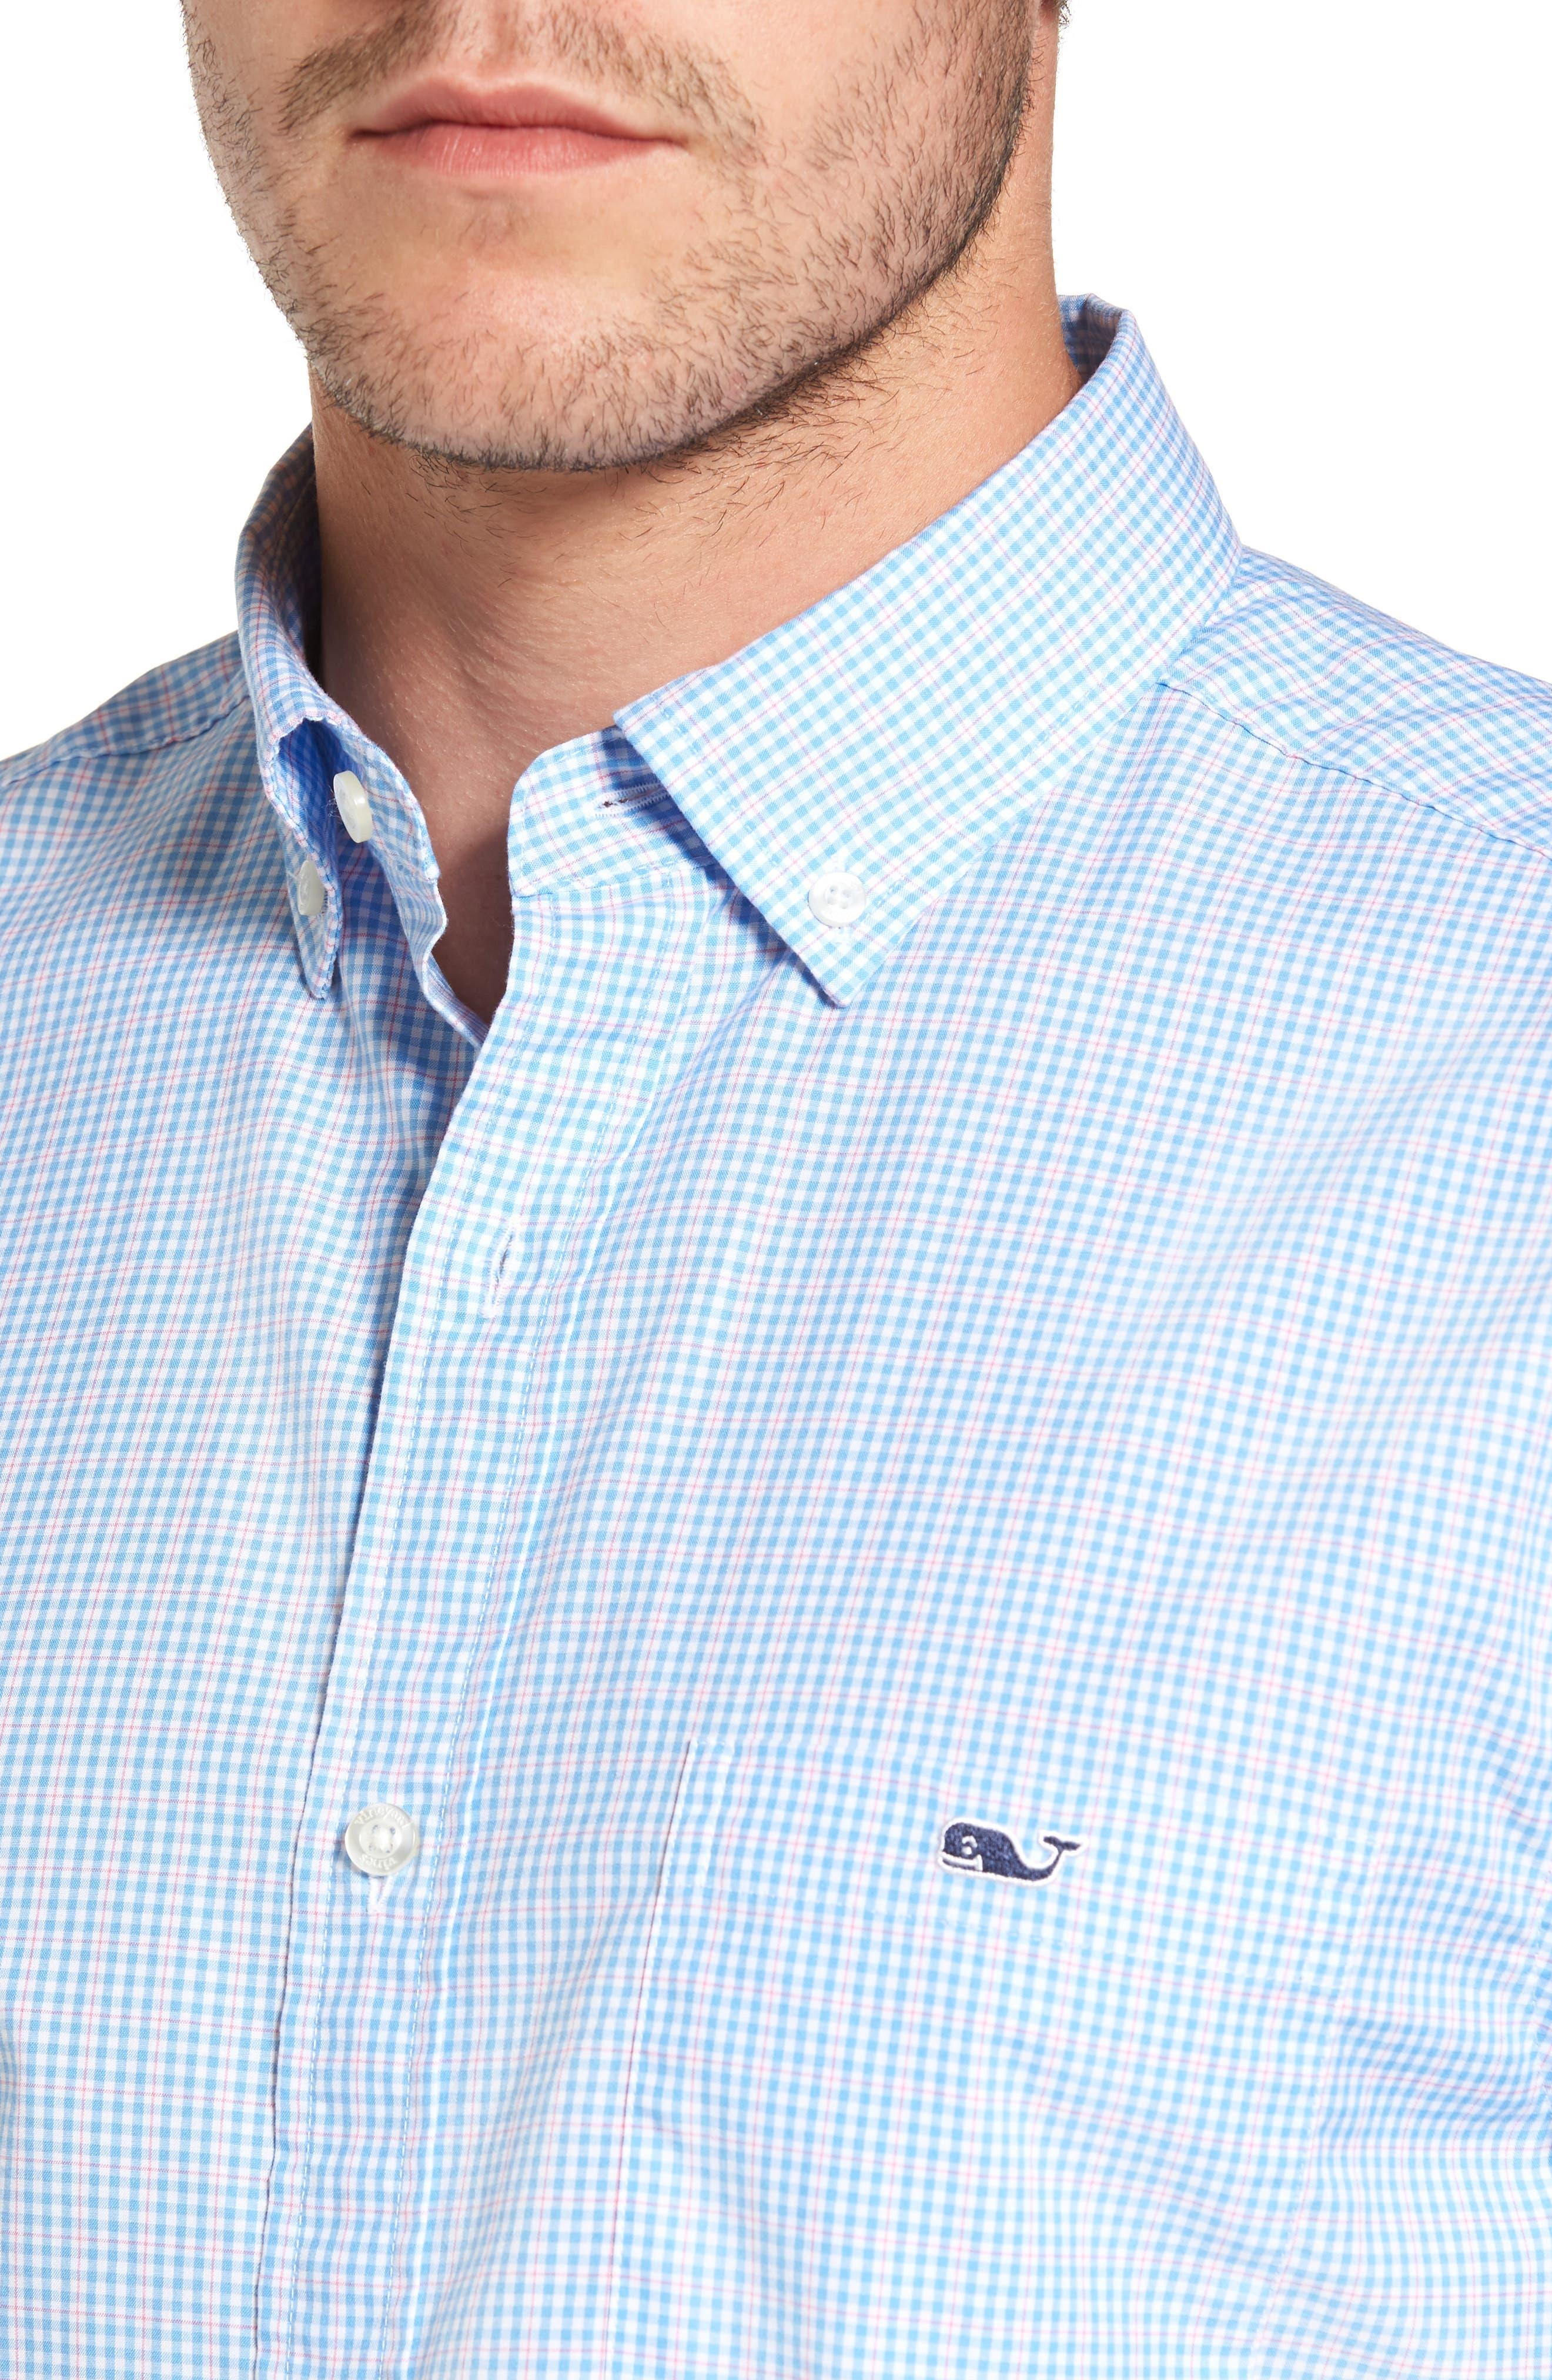 Stowaway Plaid Tucker Classic Fit Sport Shirt,                             Alternate thumbnail 4, color,                             484